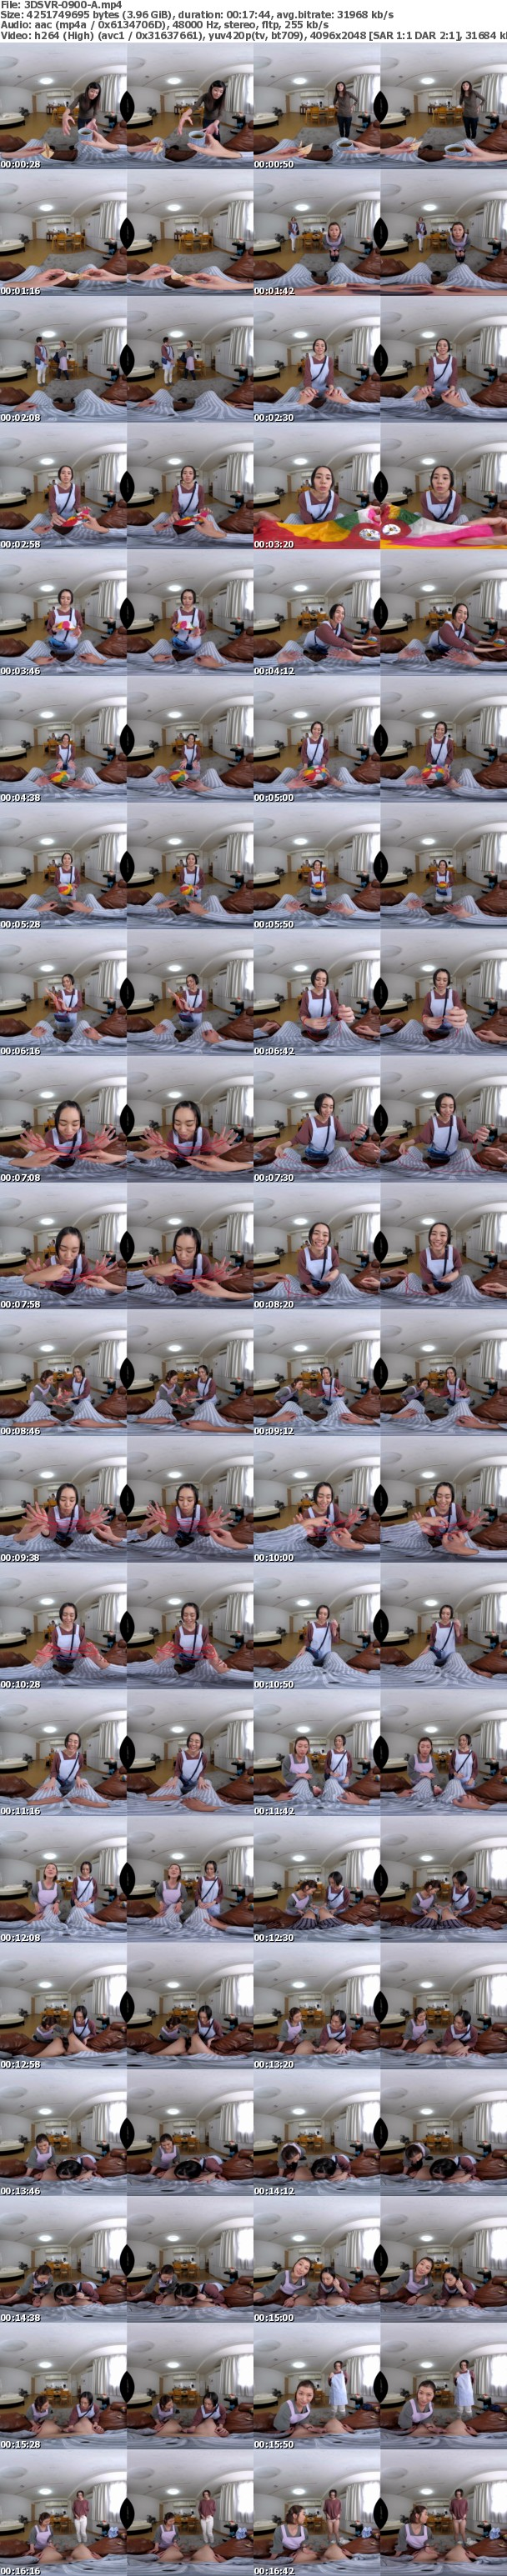 (VR) 3DSVR-0900 W介護VR 癒しのベテラン介護士と幸せ介護に恥じらう新人介護士